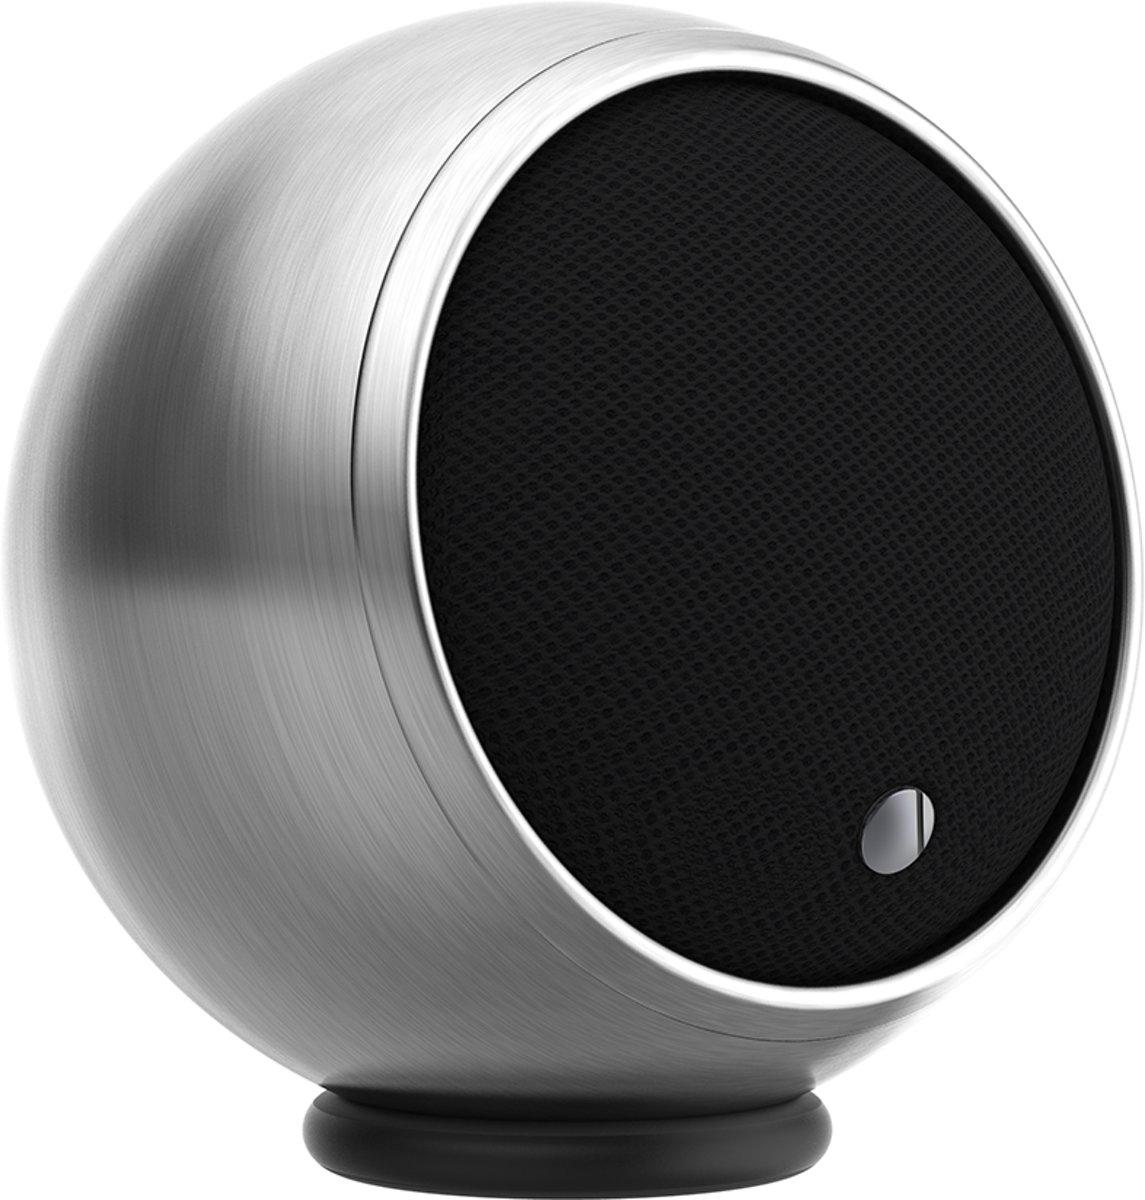 Gallo Acoustics Micro RVS compacte speaker voor €149 @ Coolblue